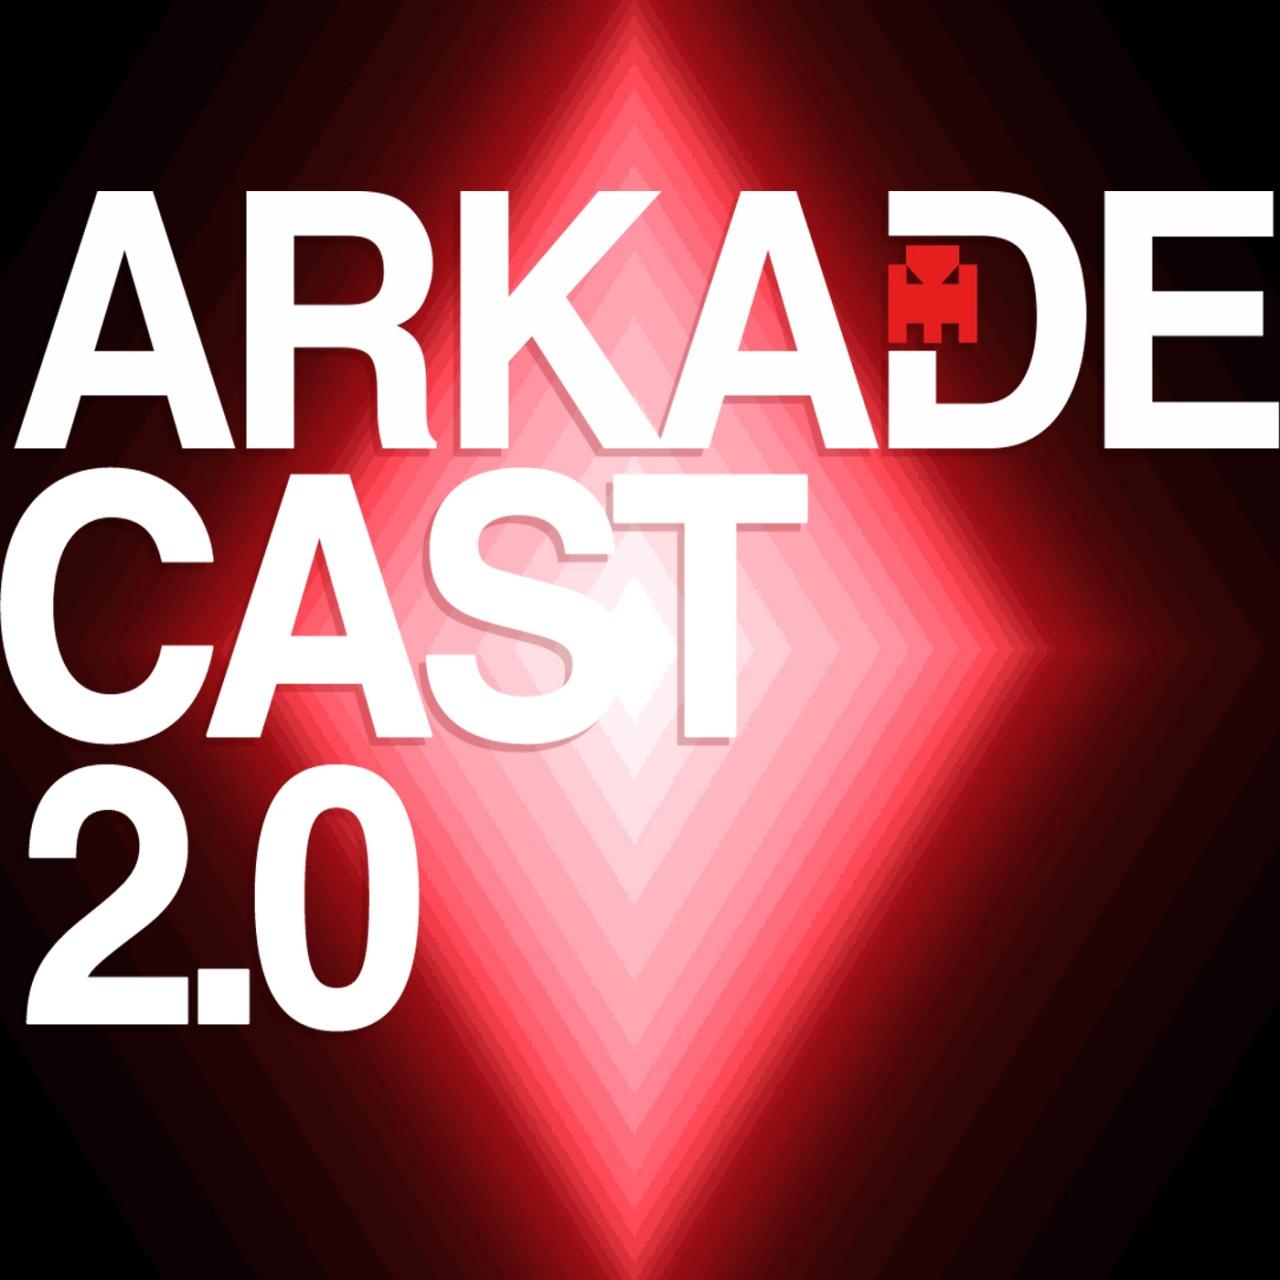 ArkadeCast 2.0